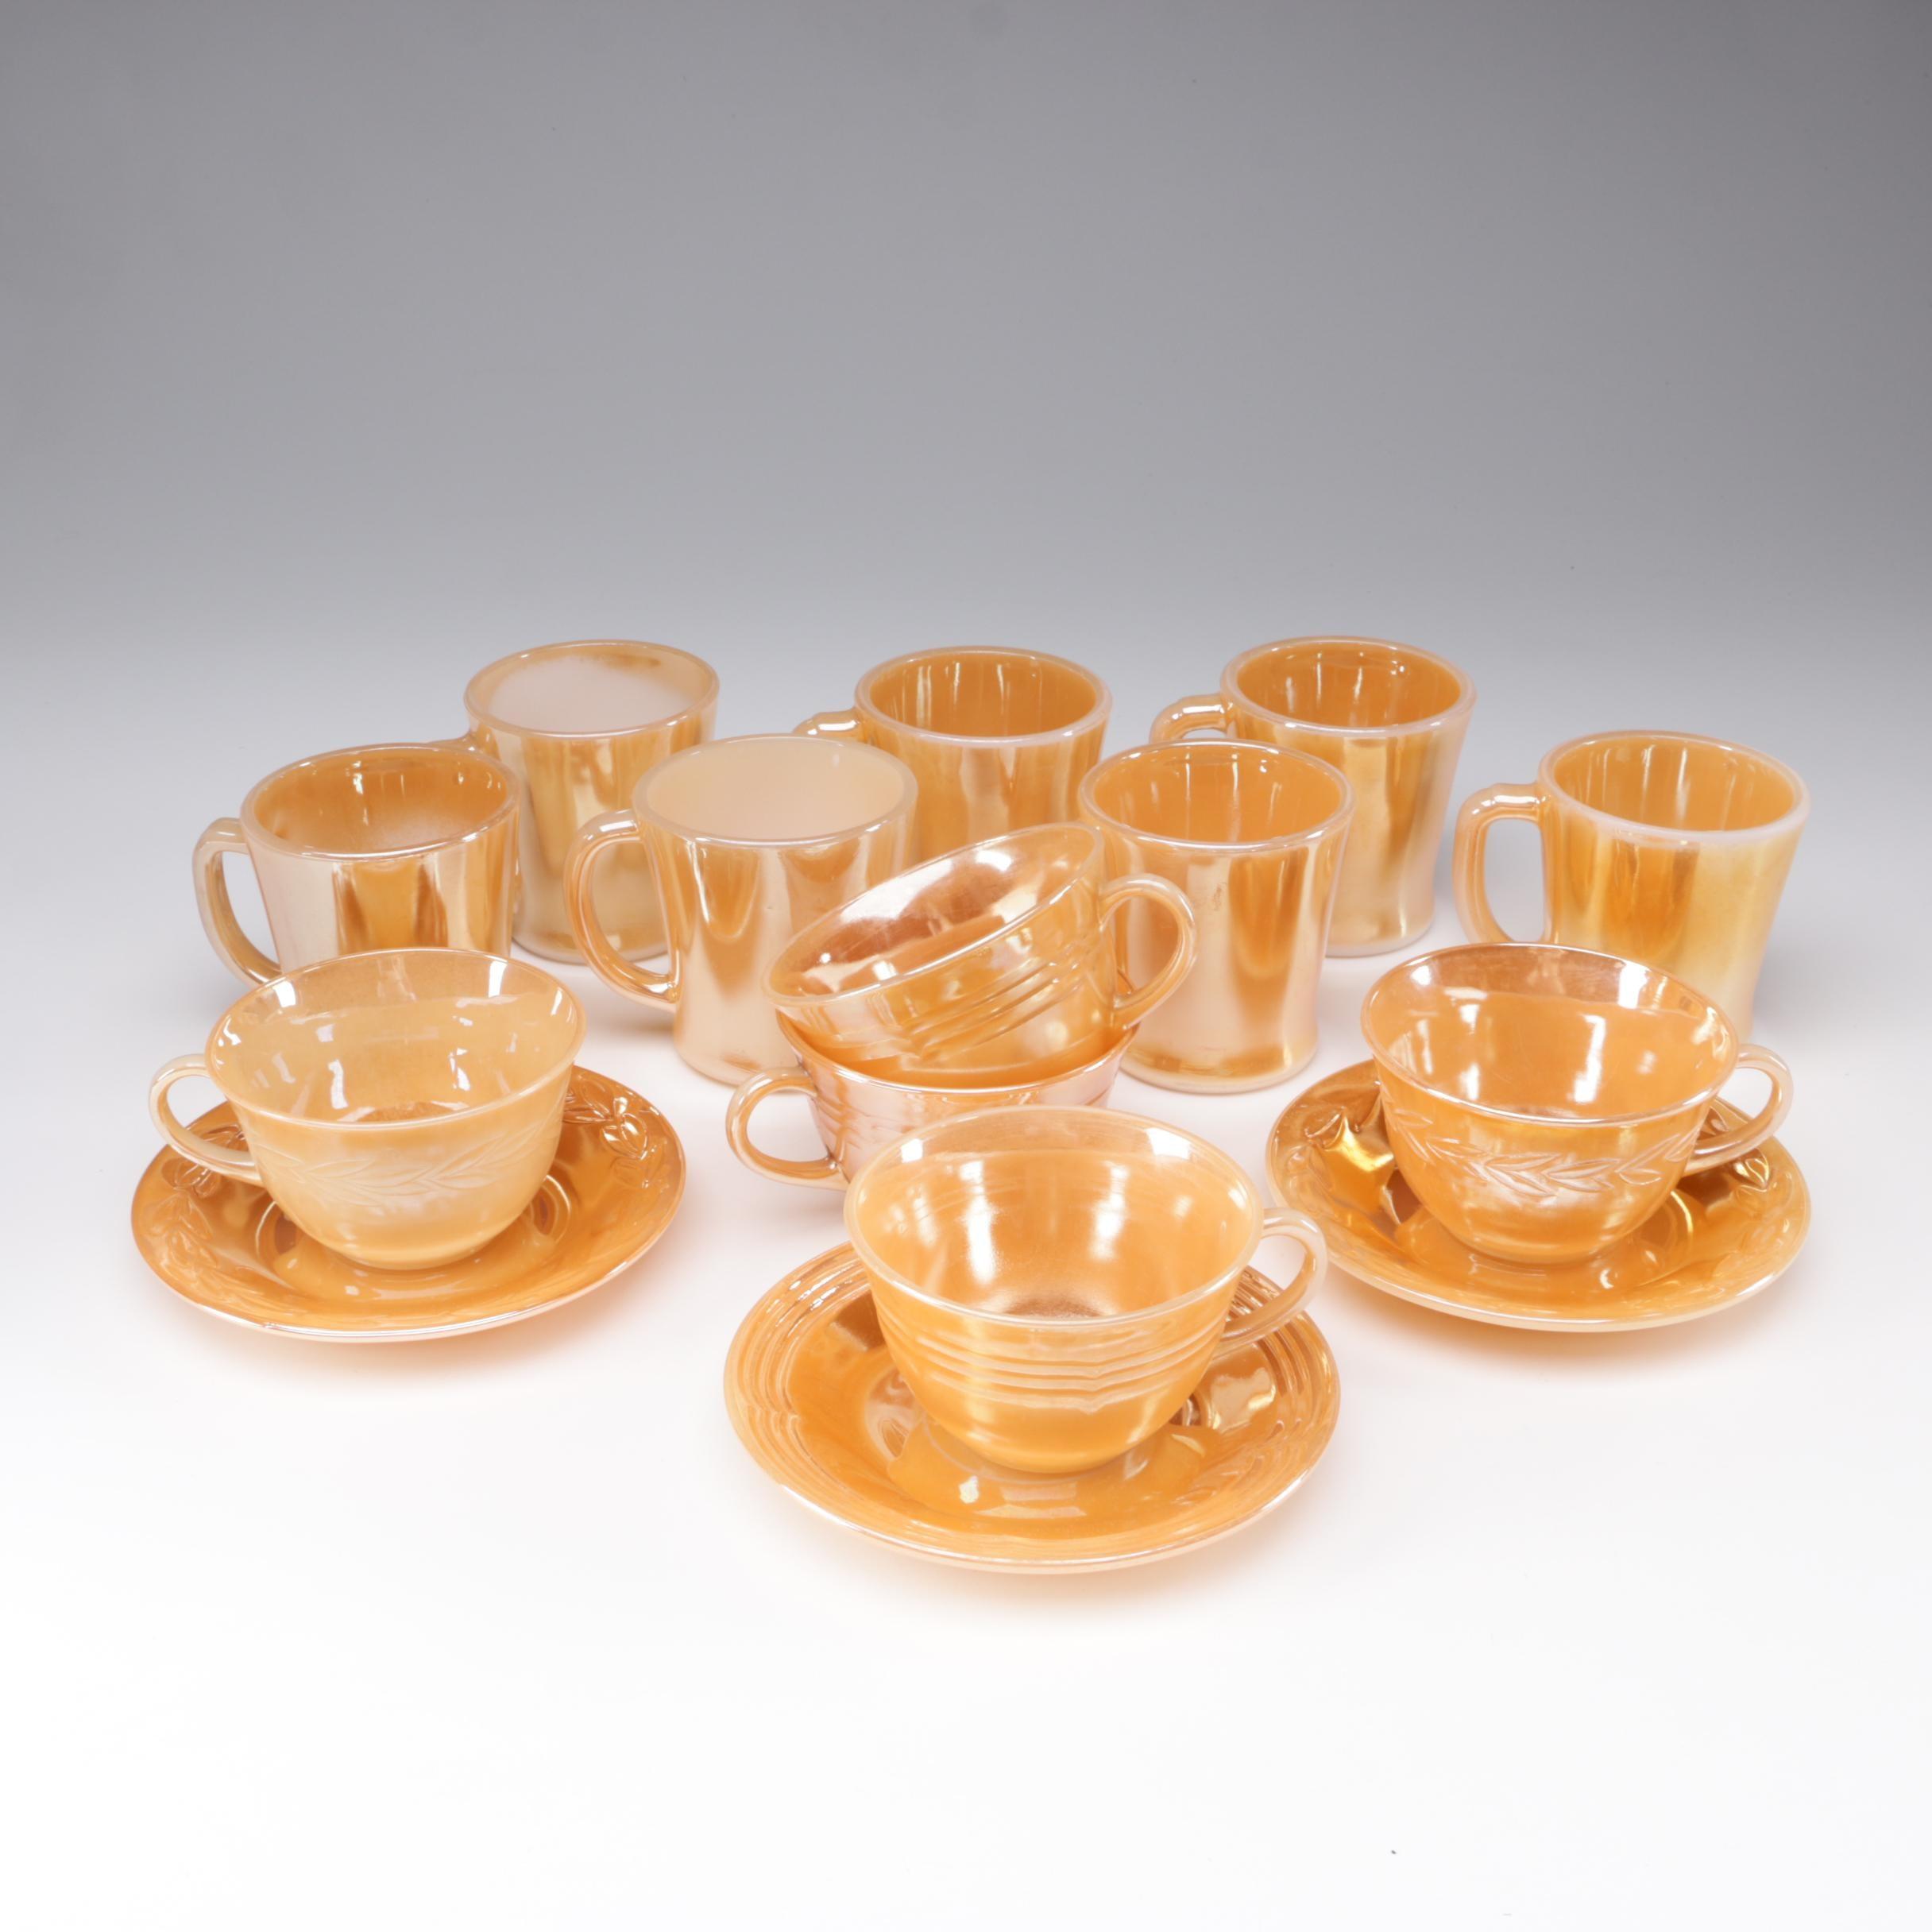 Fire-King Peach Lusterware Glass Teacups and Mugs, 1950s/1960s